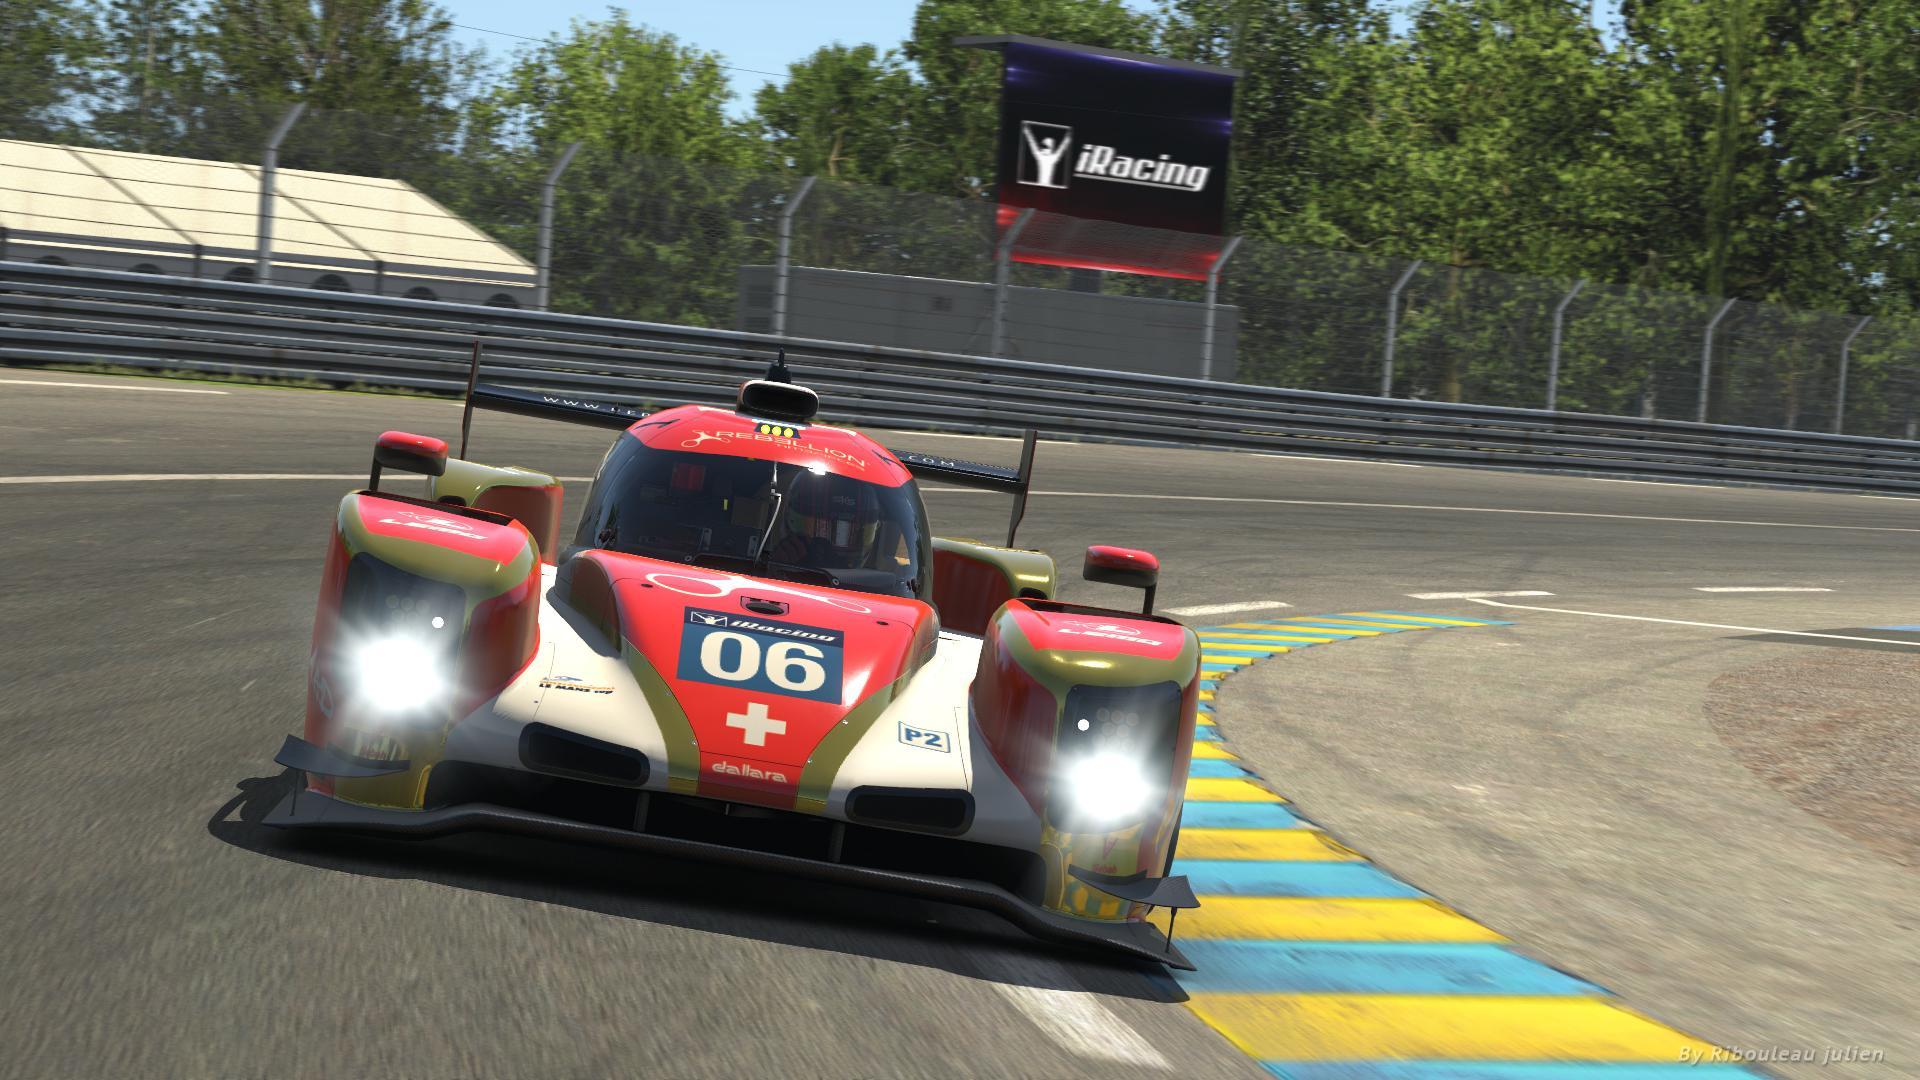 Preview of Rebellion Lola 2011 - Dallara p217 by Julien Ribouleau